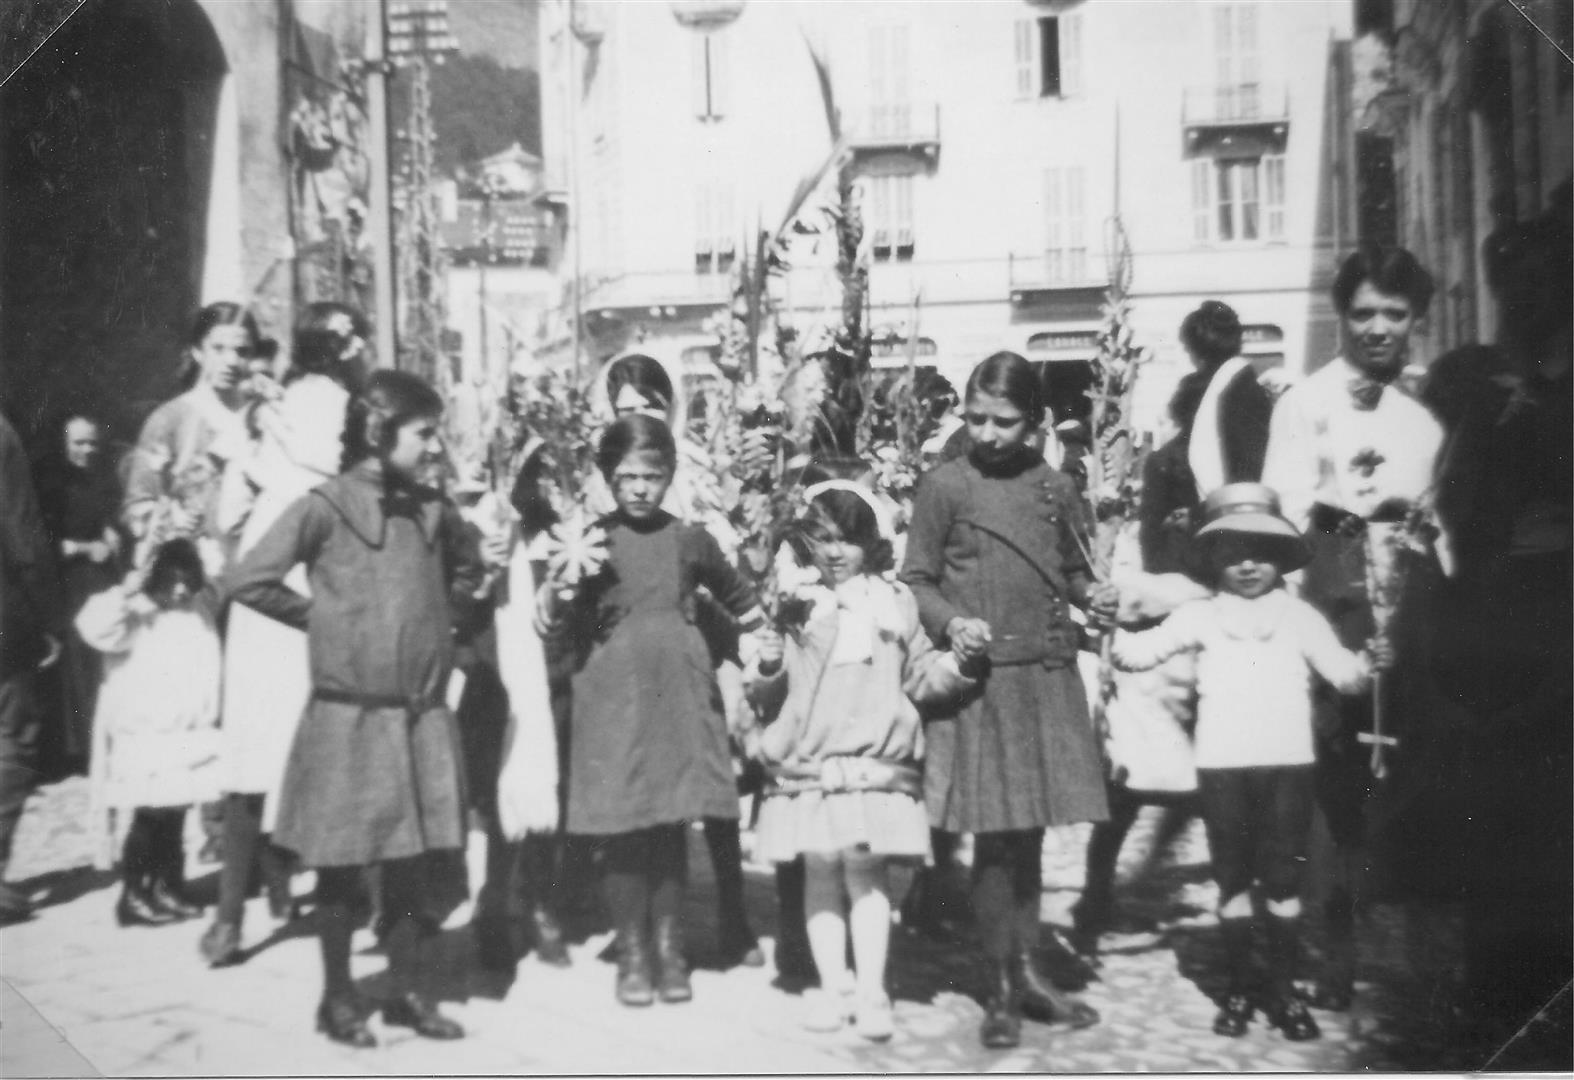 palmsunday-office-liguria-alassio-1914-iisl-002